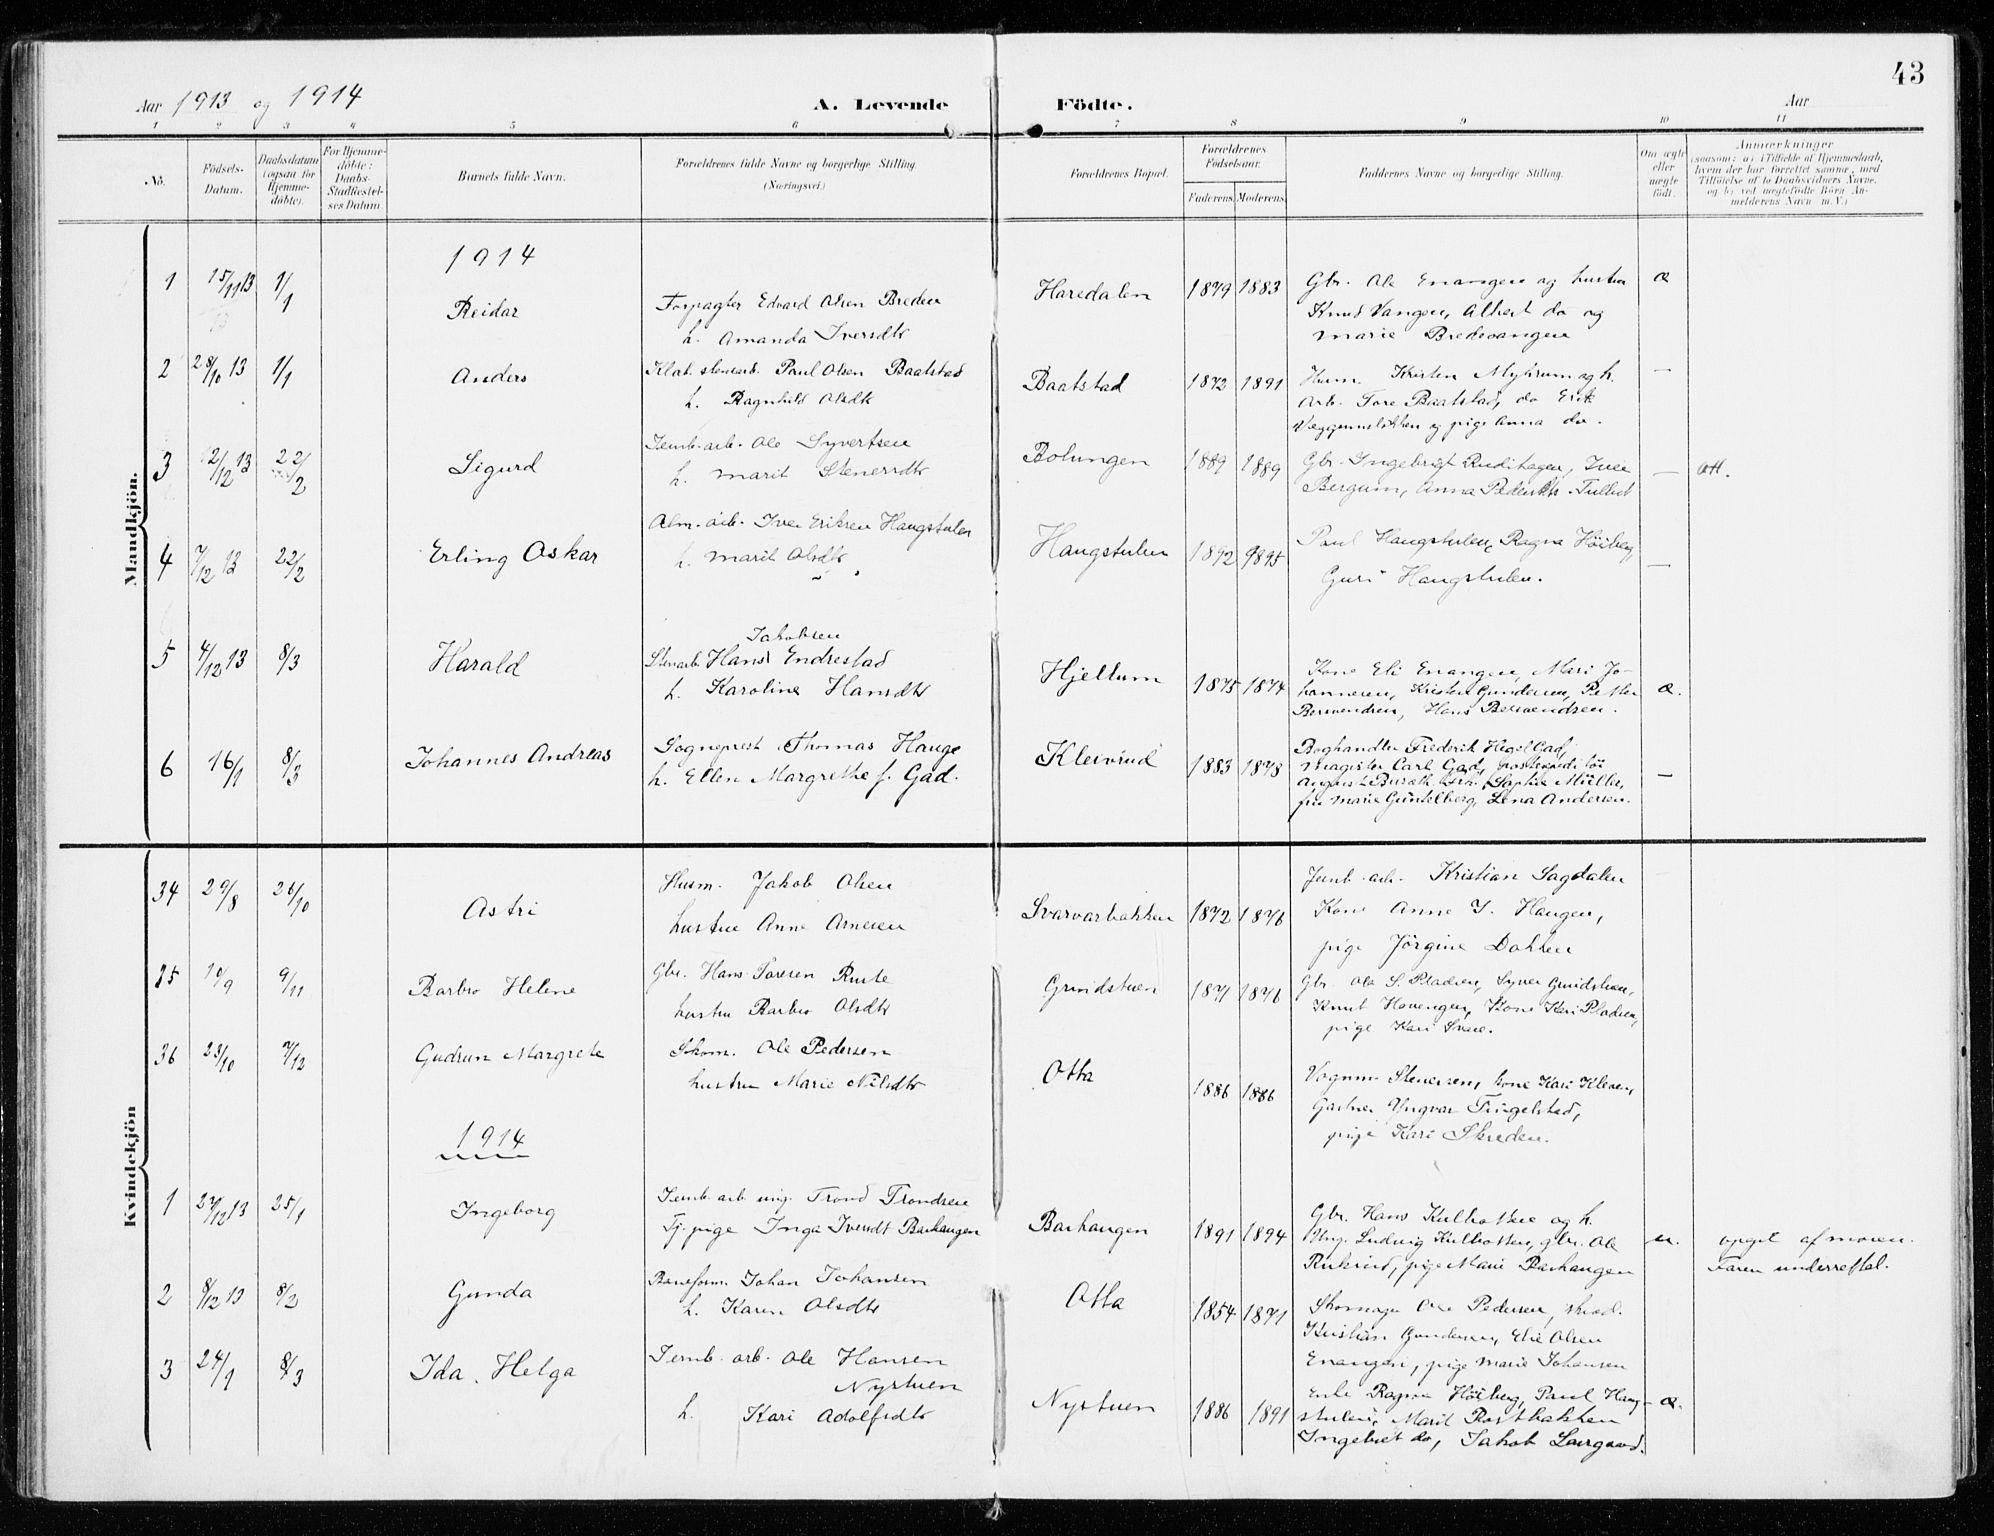 SAH, Sel prestekontor, Ministerialbok nr. 2, 1905-1919, s. 43